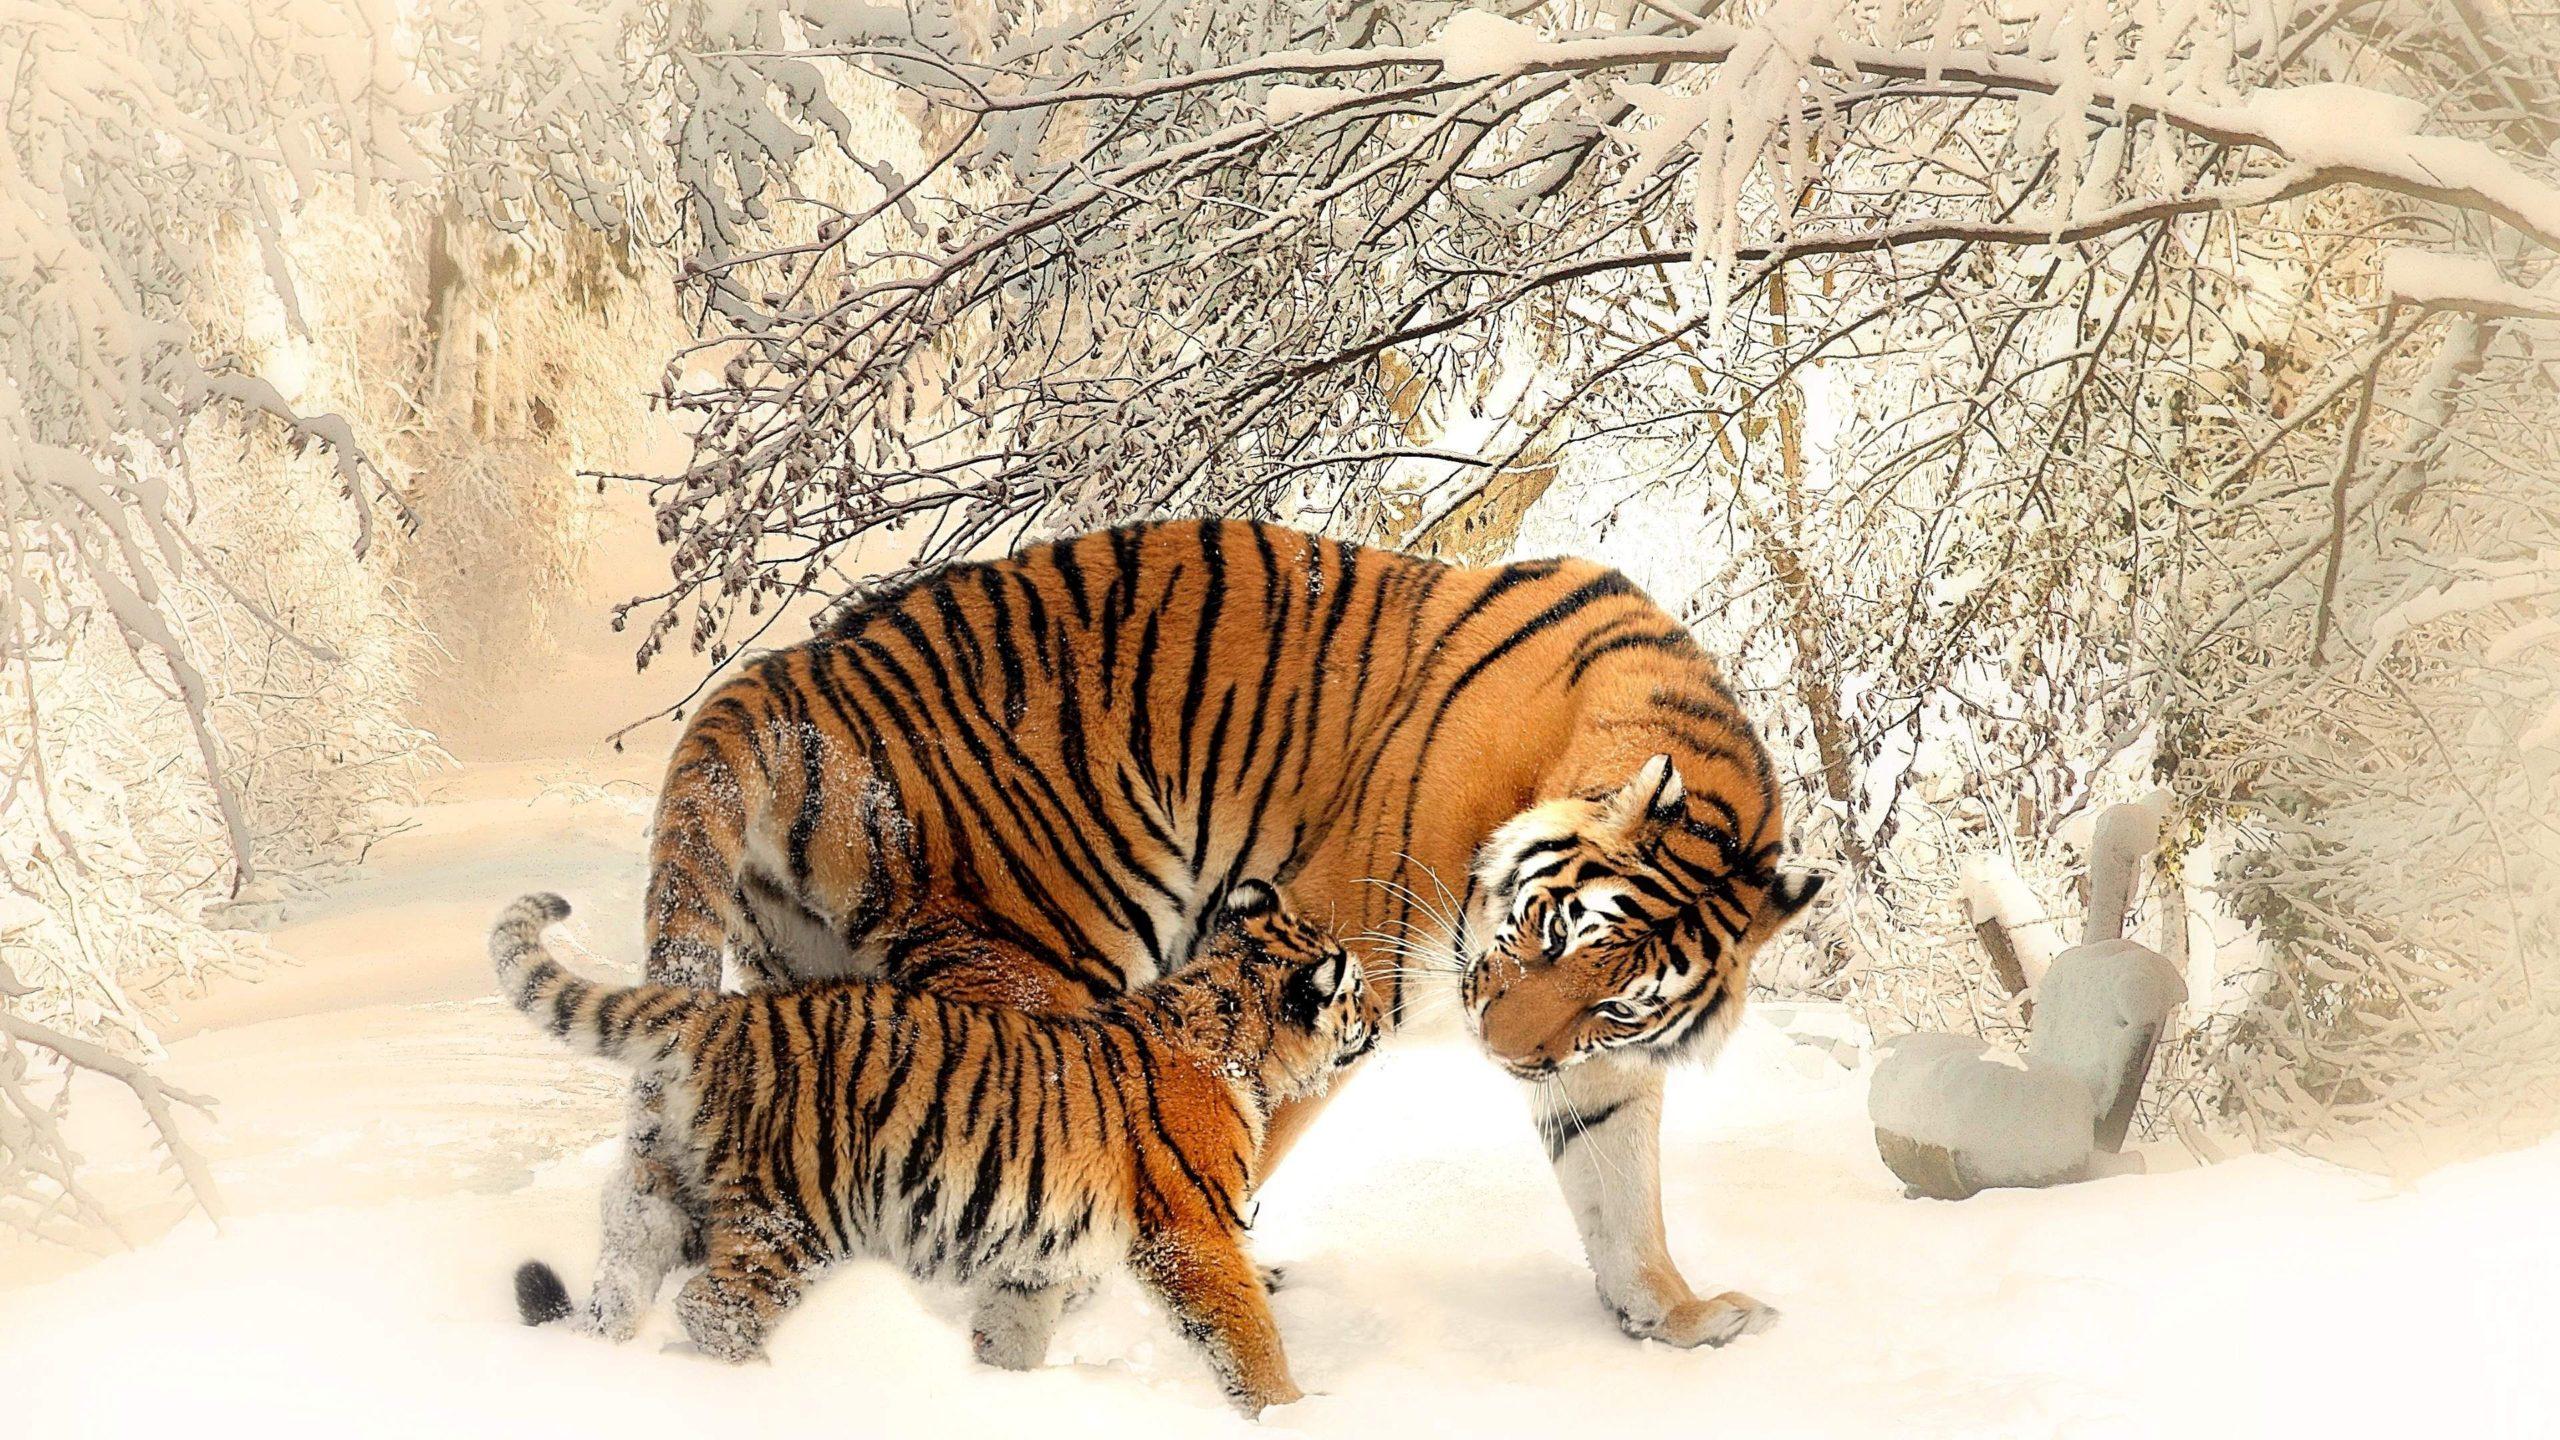 tiger hd wallpapers 1080p